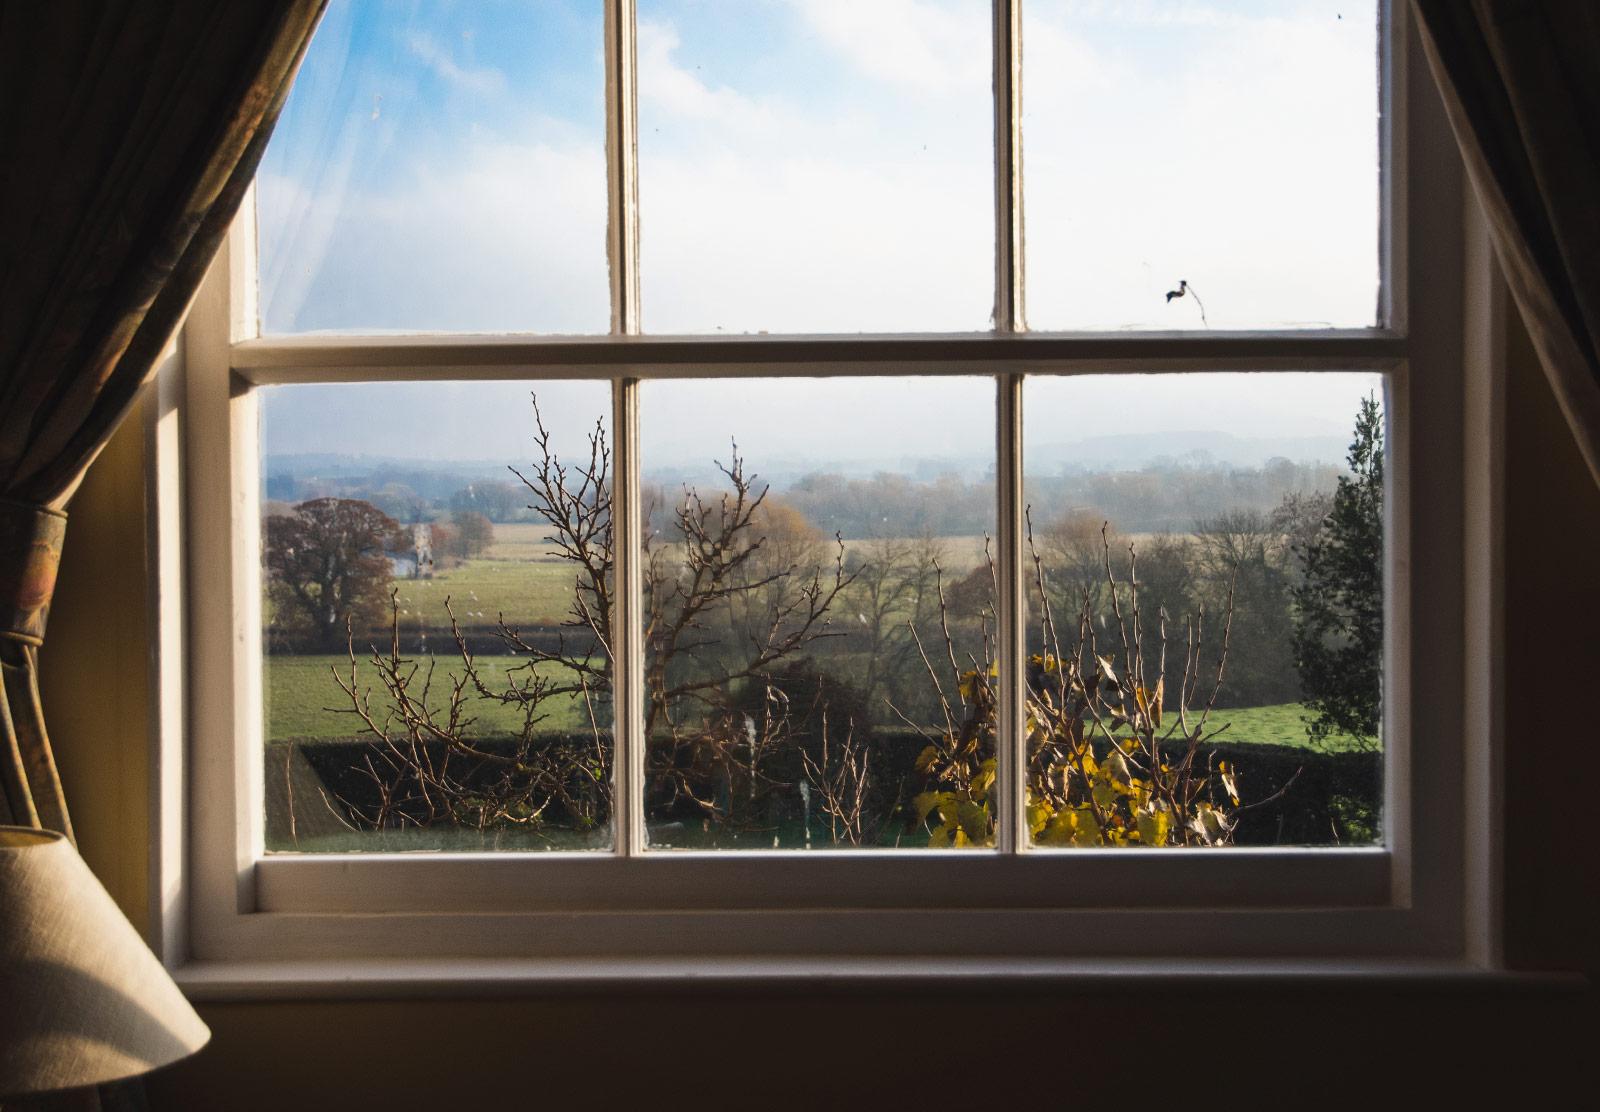 Rural view through window